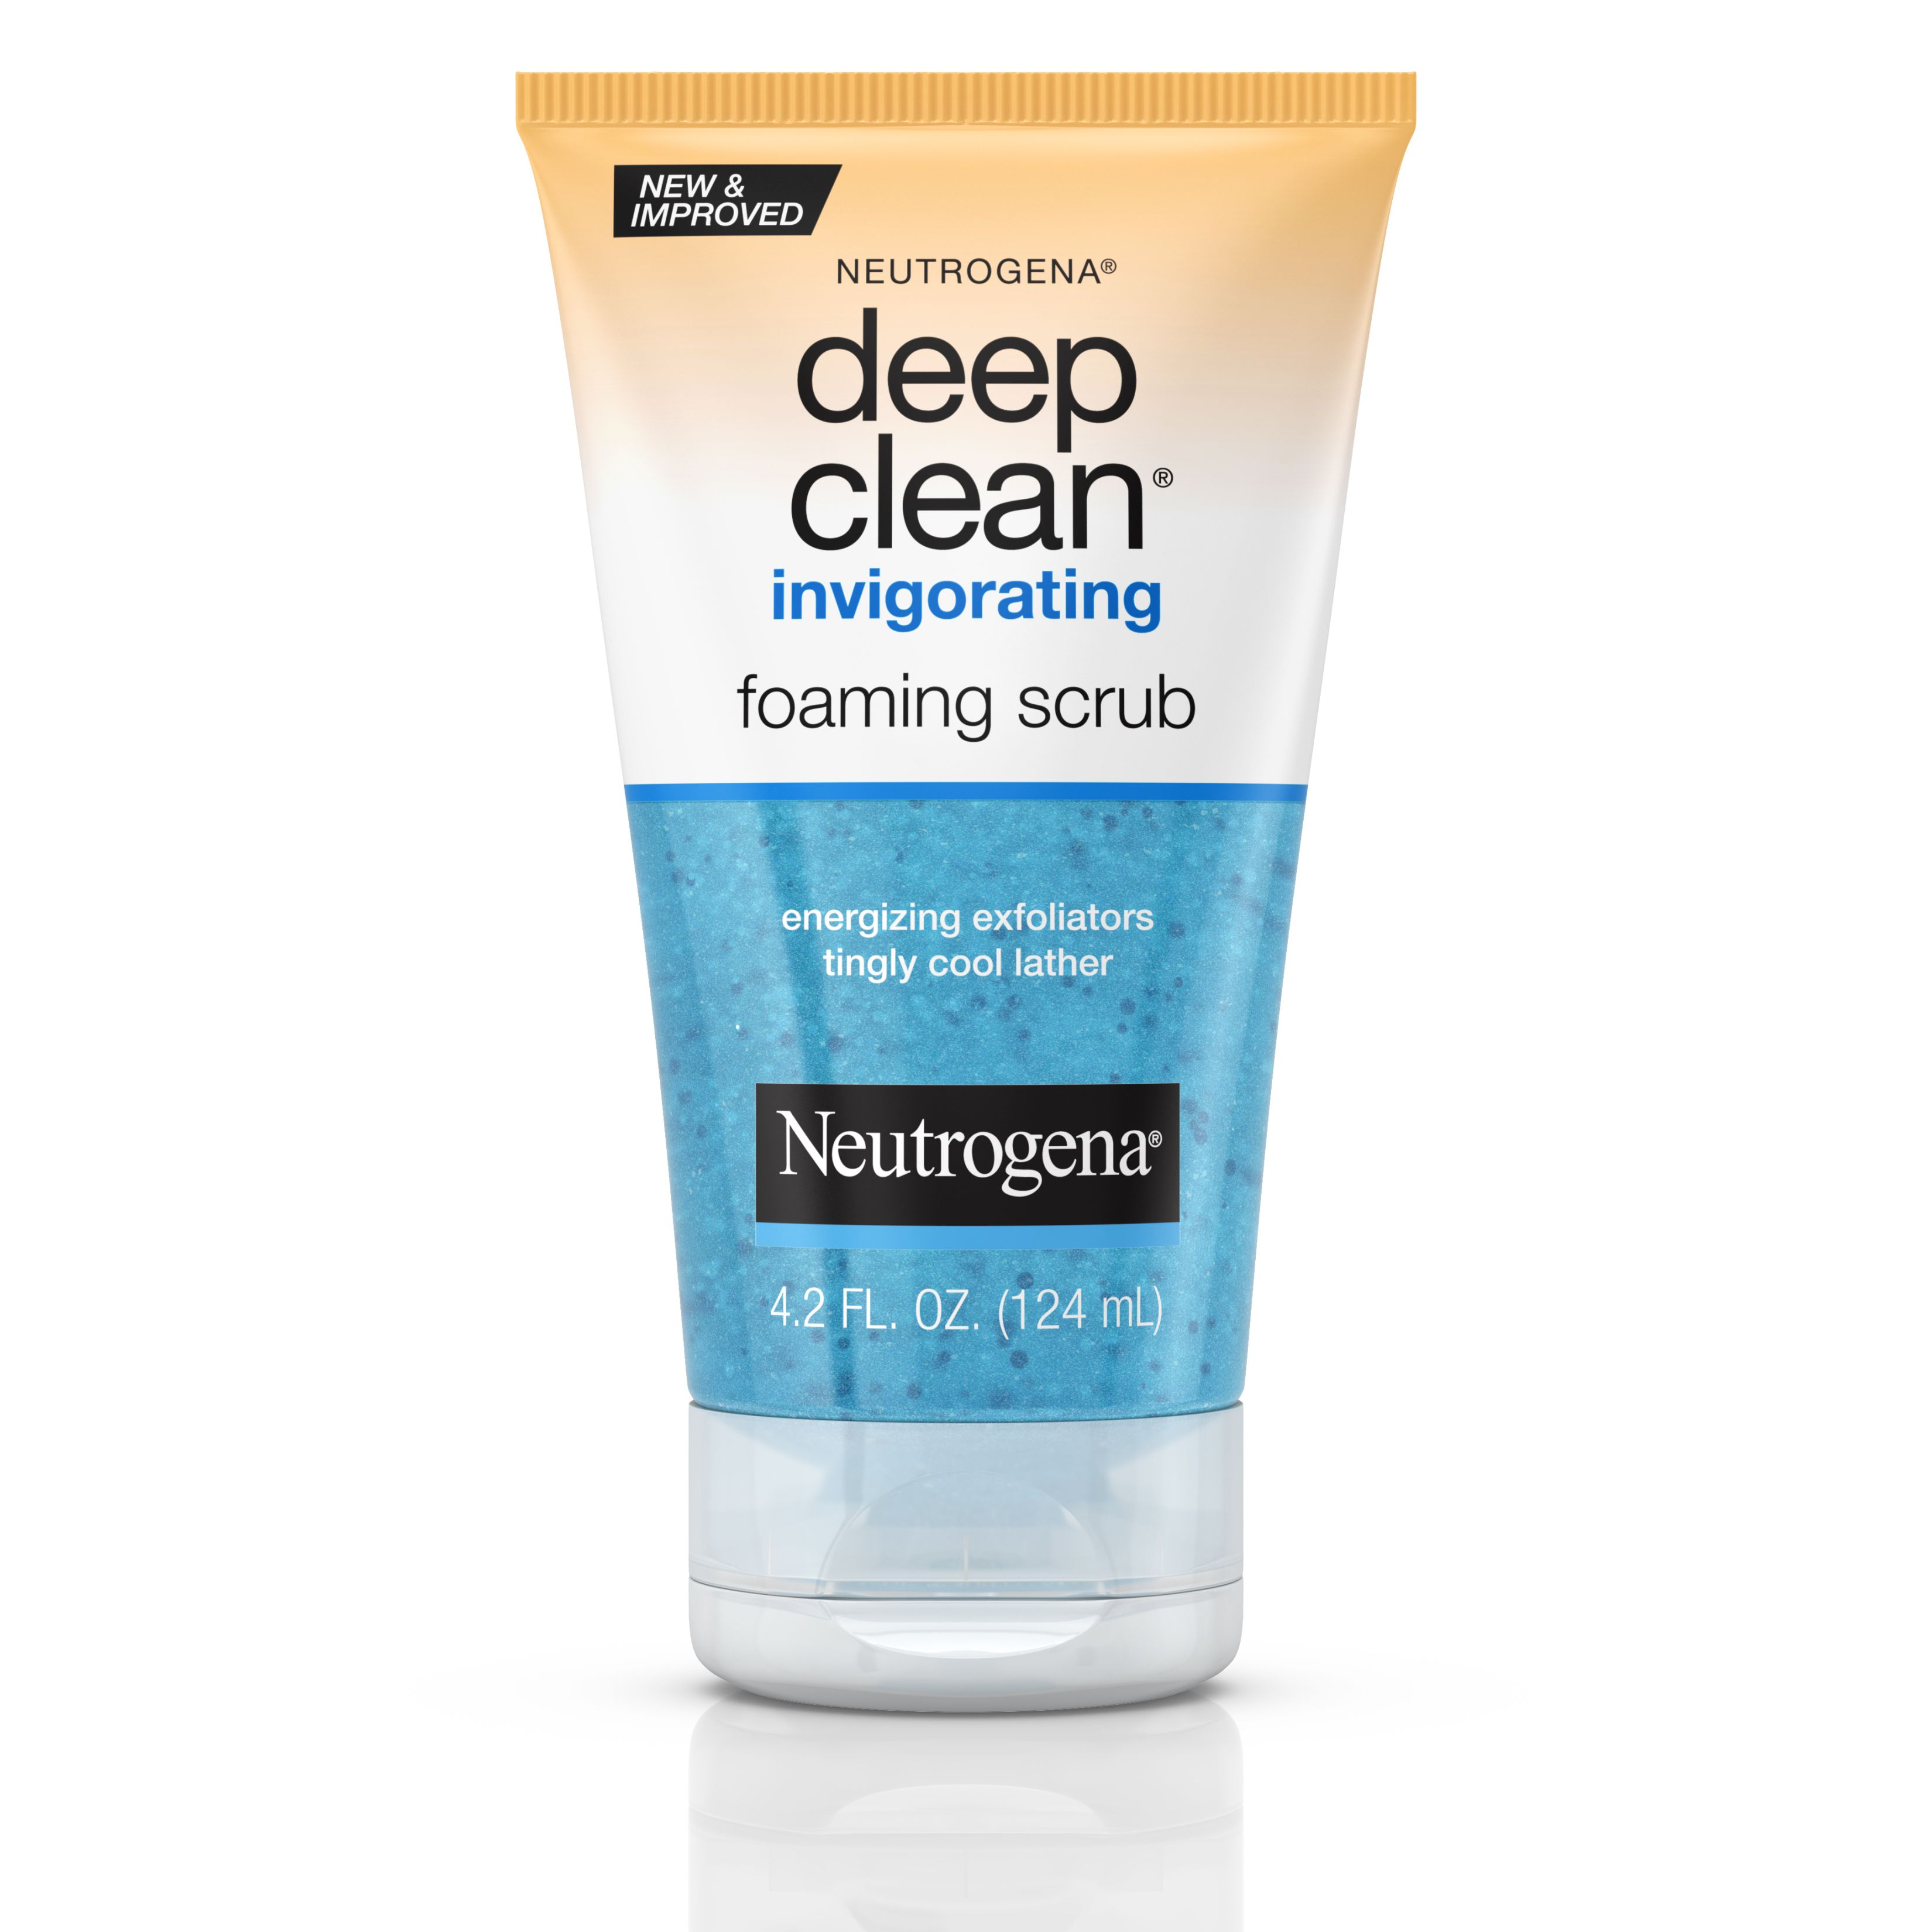 Deep Clean Invigorating Foaming Face Scrub Neutrogena In 2020